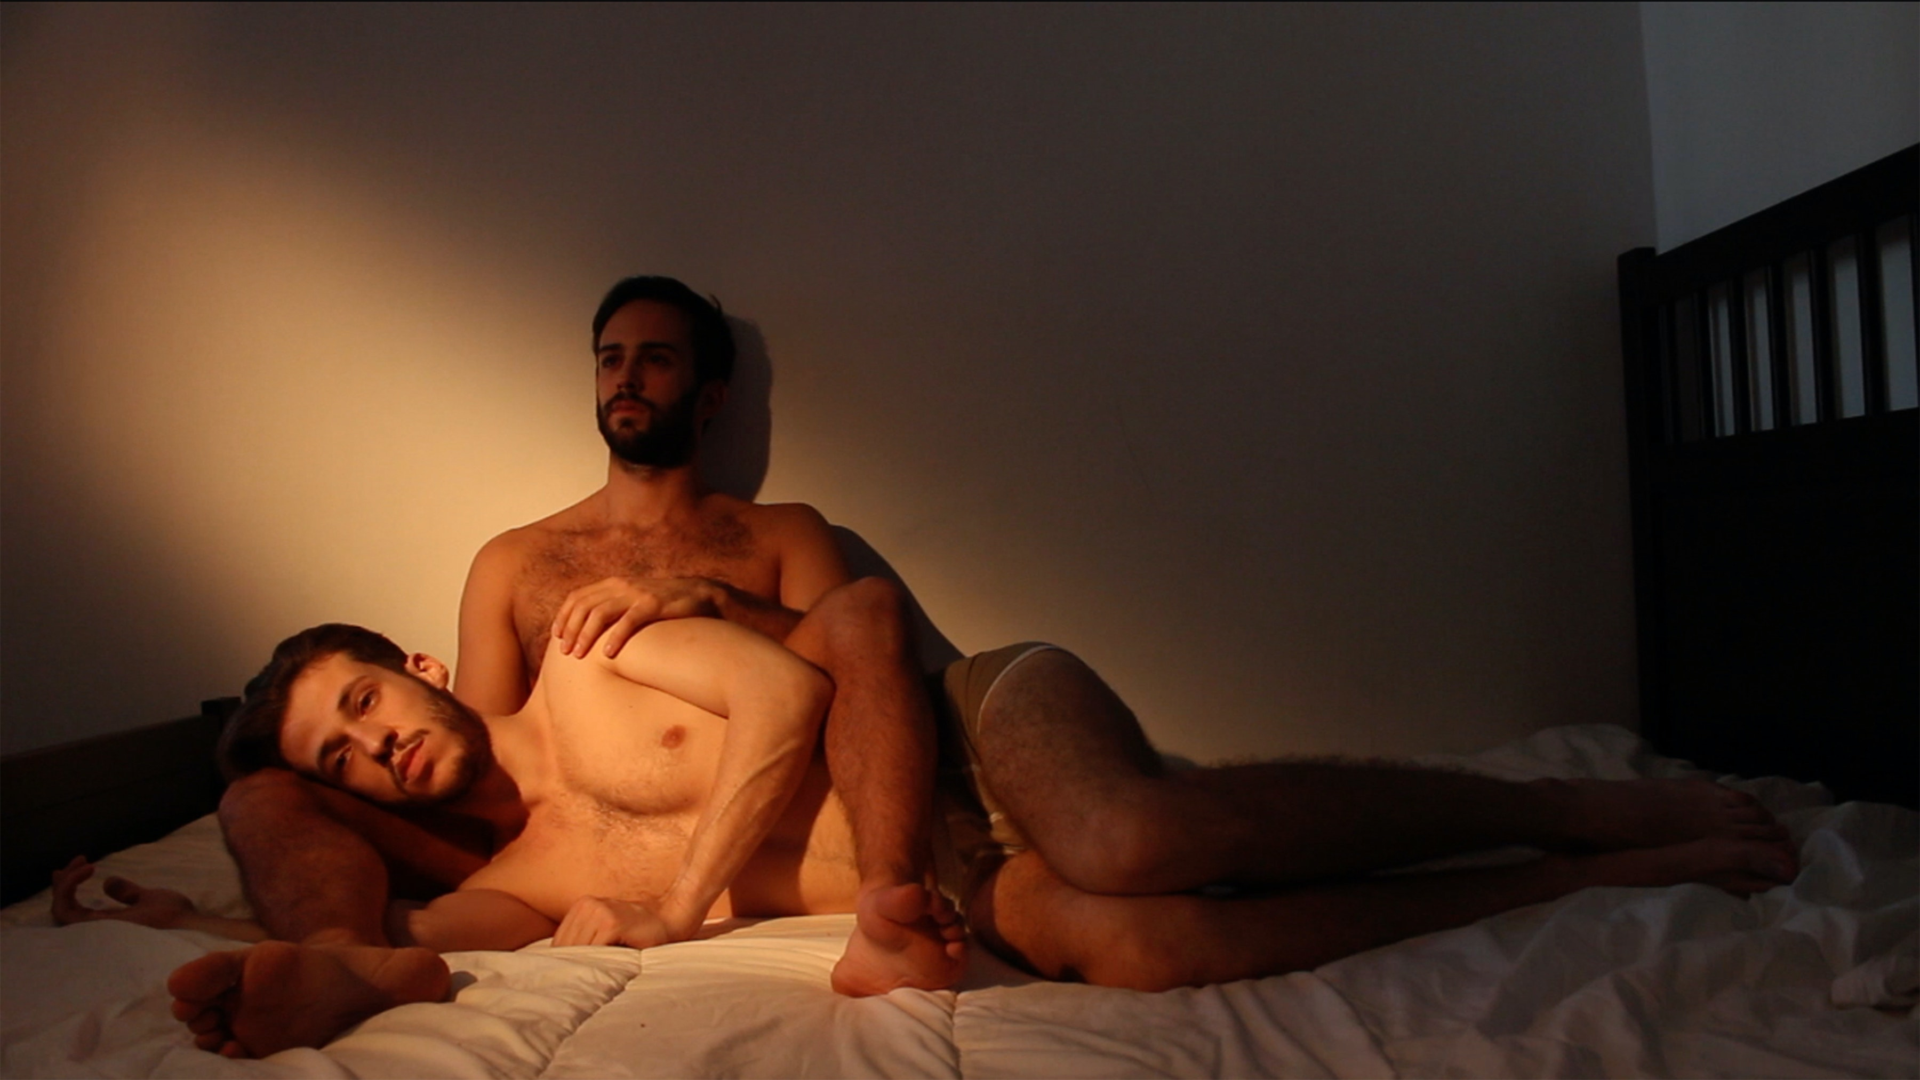 Daily gay sex movie